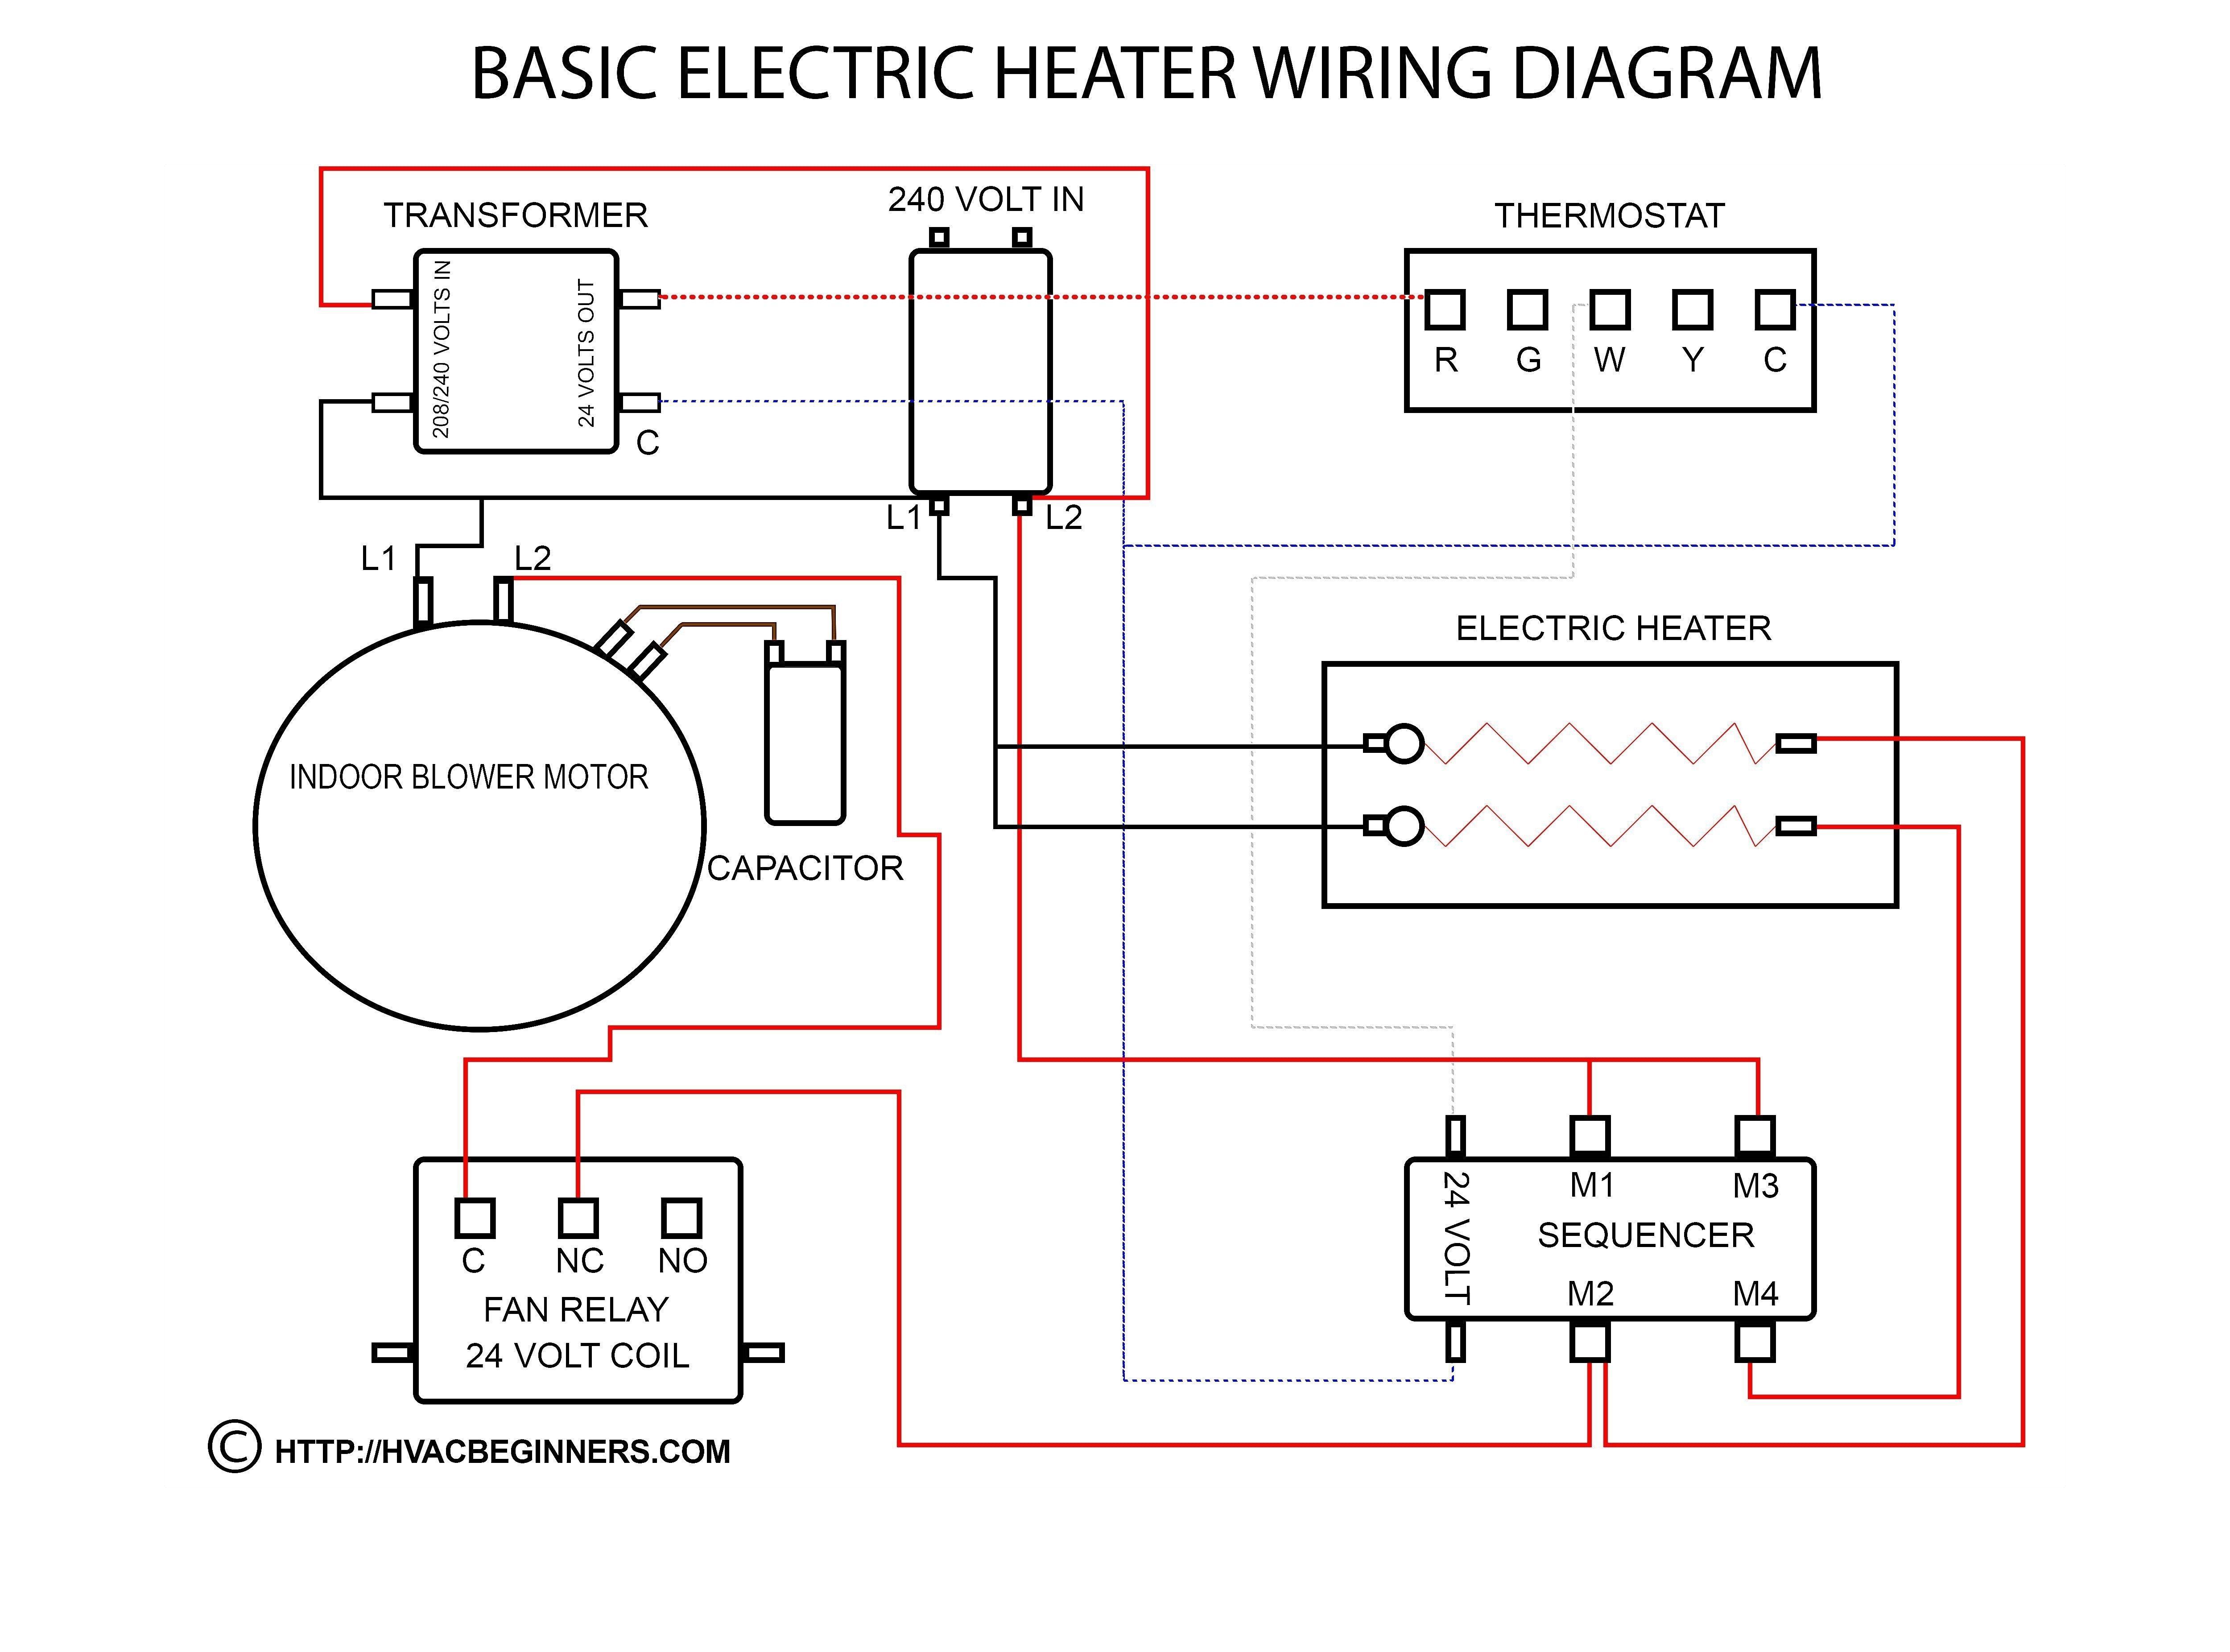 Hvac Blower Motor Wiring Diagram New In 2020 Basic Electrical Wiring Thermostat Wiring Electrical Circuit Diagram